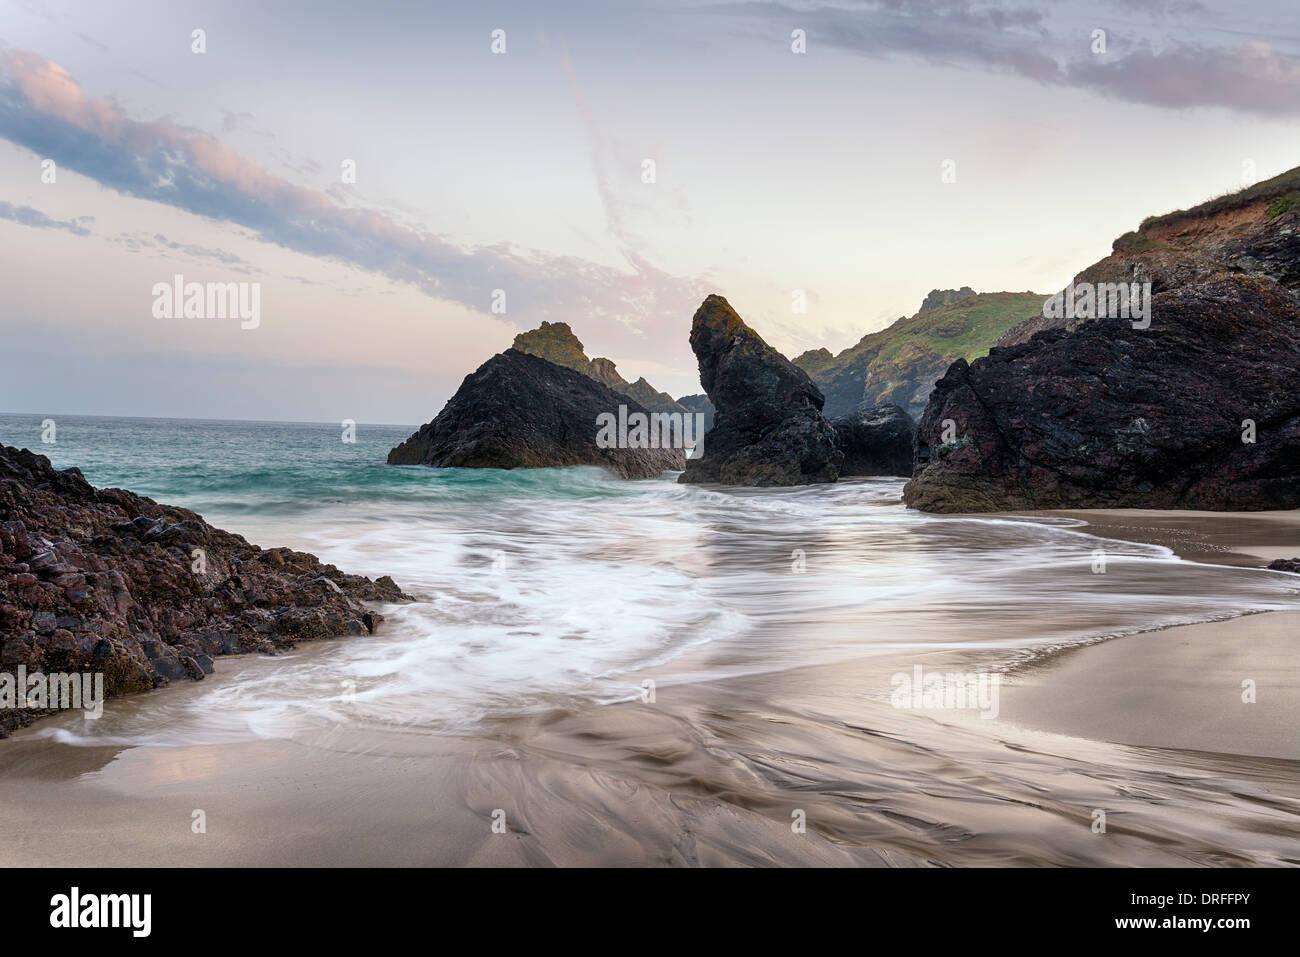 Sonnenuntergang am Kynance Cove Beach auf die Eidechse in Cornwall Stockbild